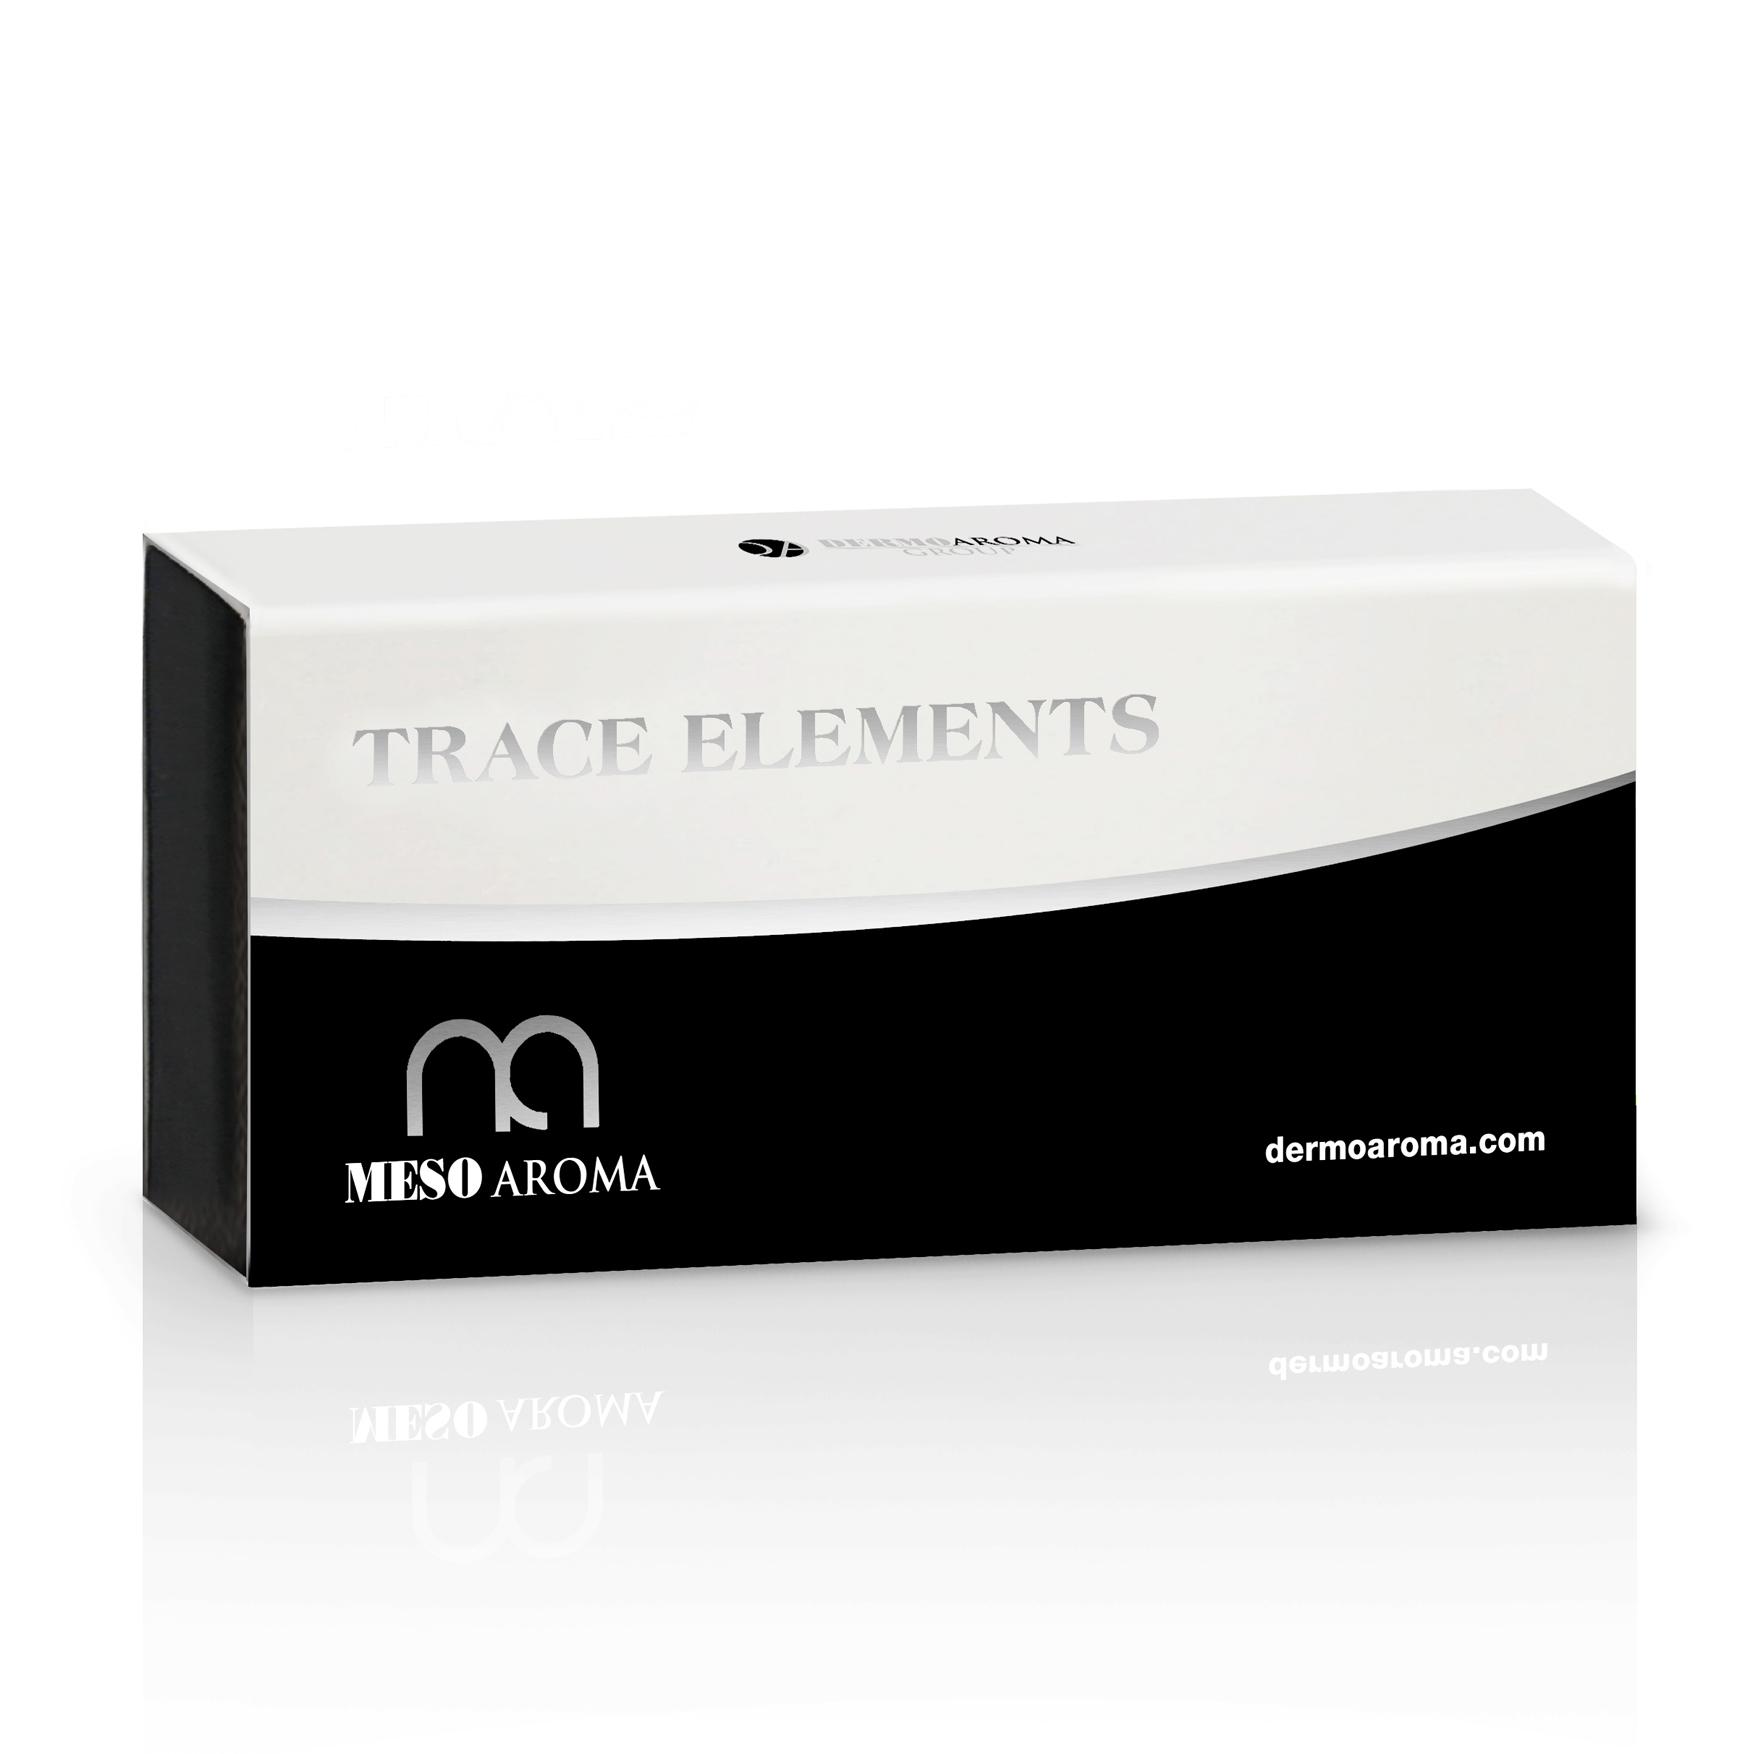 Mesoaroma-ampułki-do-mezoterapii-TRACE-ELEMENTS